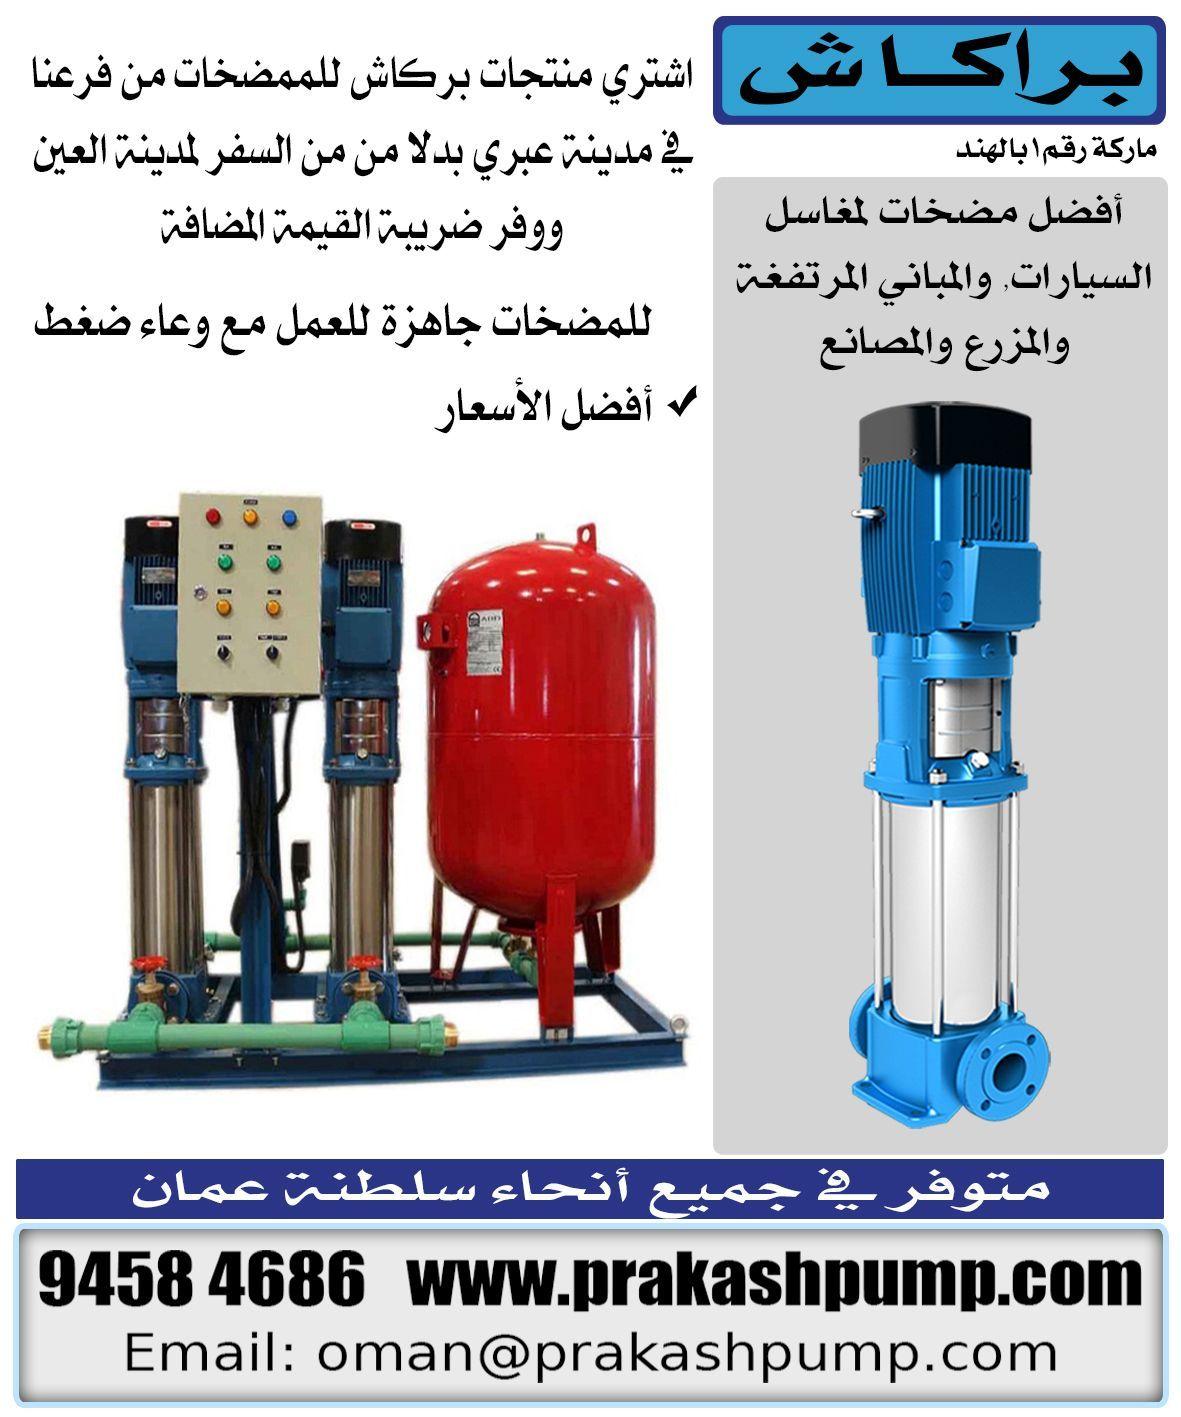 Prakash Prakashpump Prakashpumpest Water Motor Waterpump New Design Sale Uae Oman Home Appliances Vacuum Vacuum Cleaner